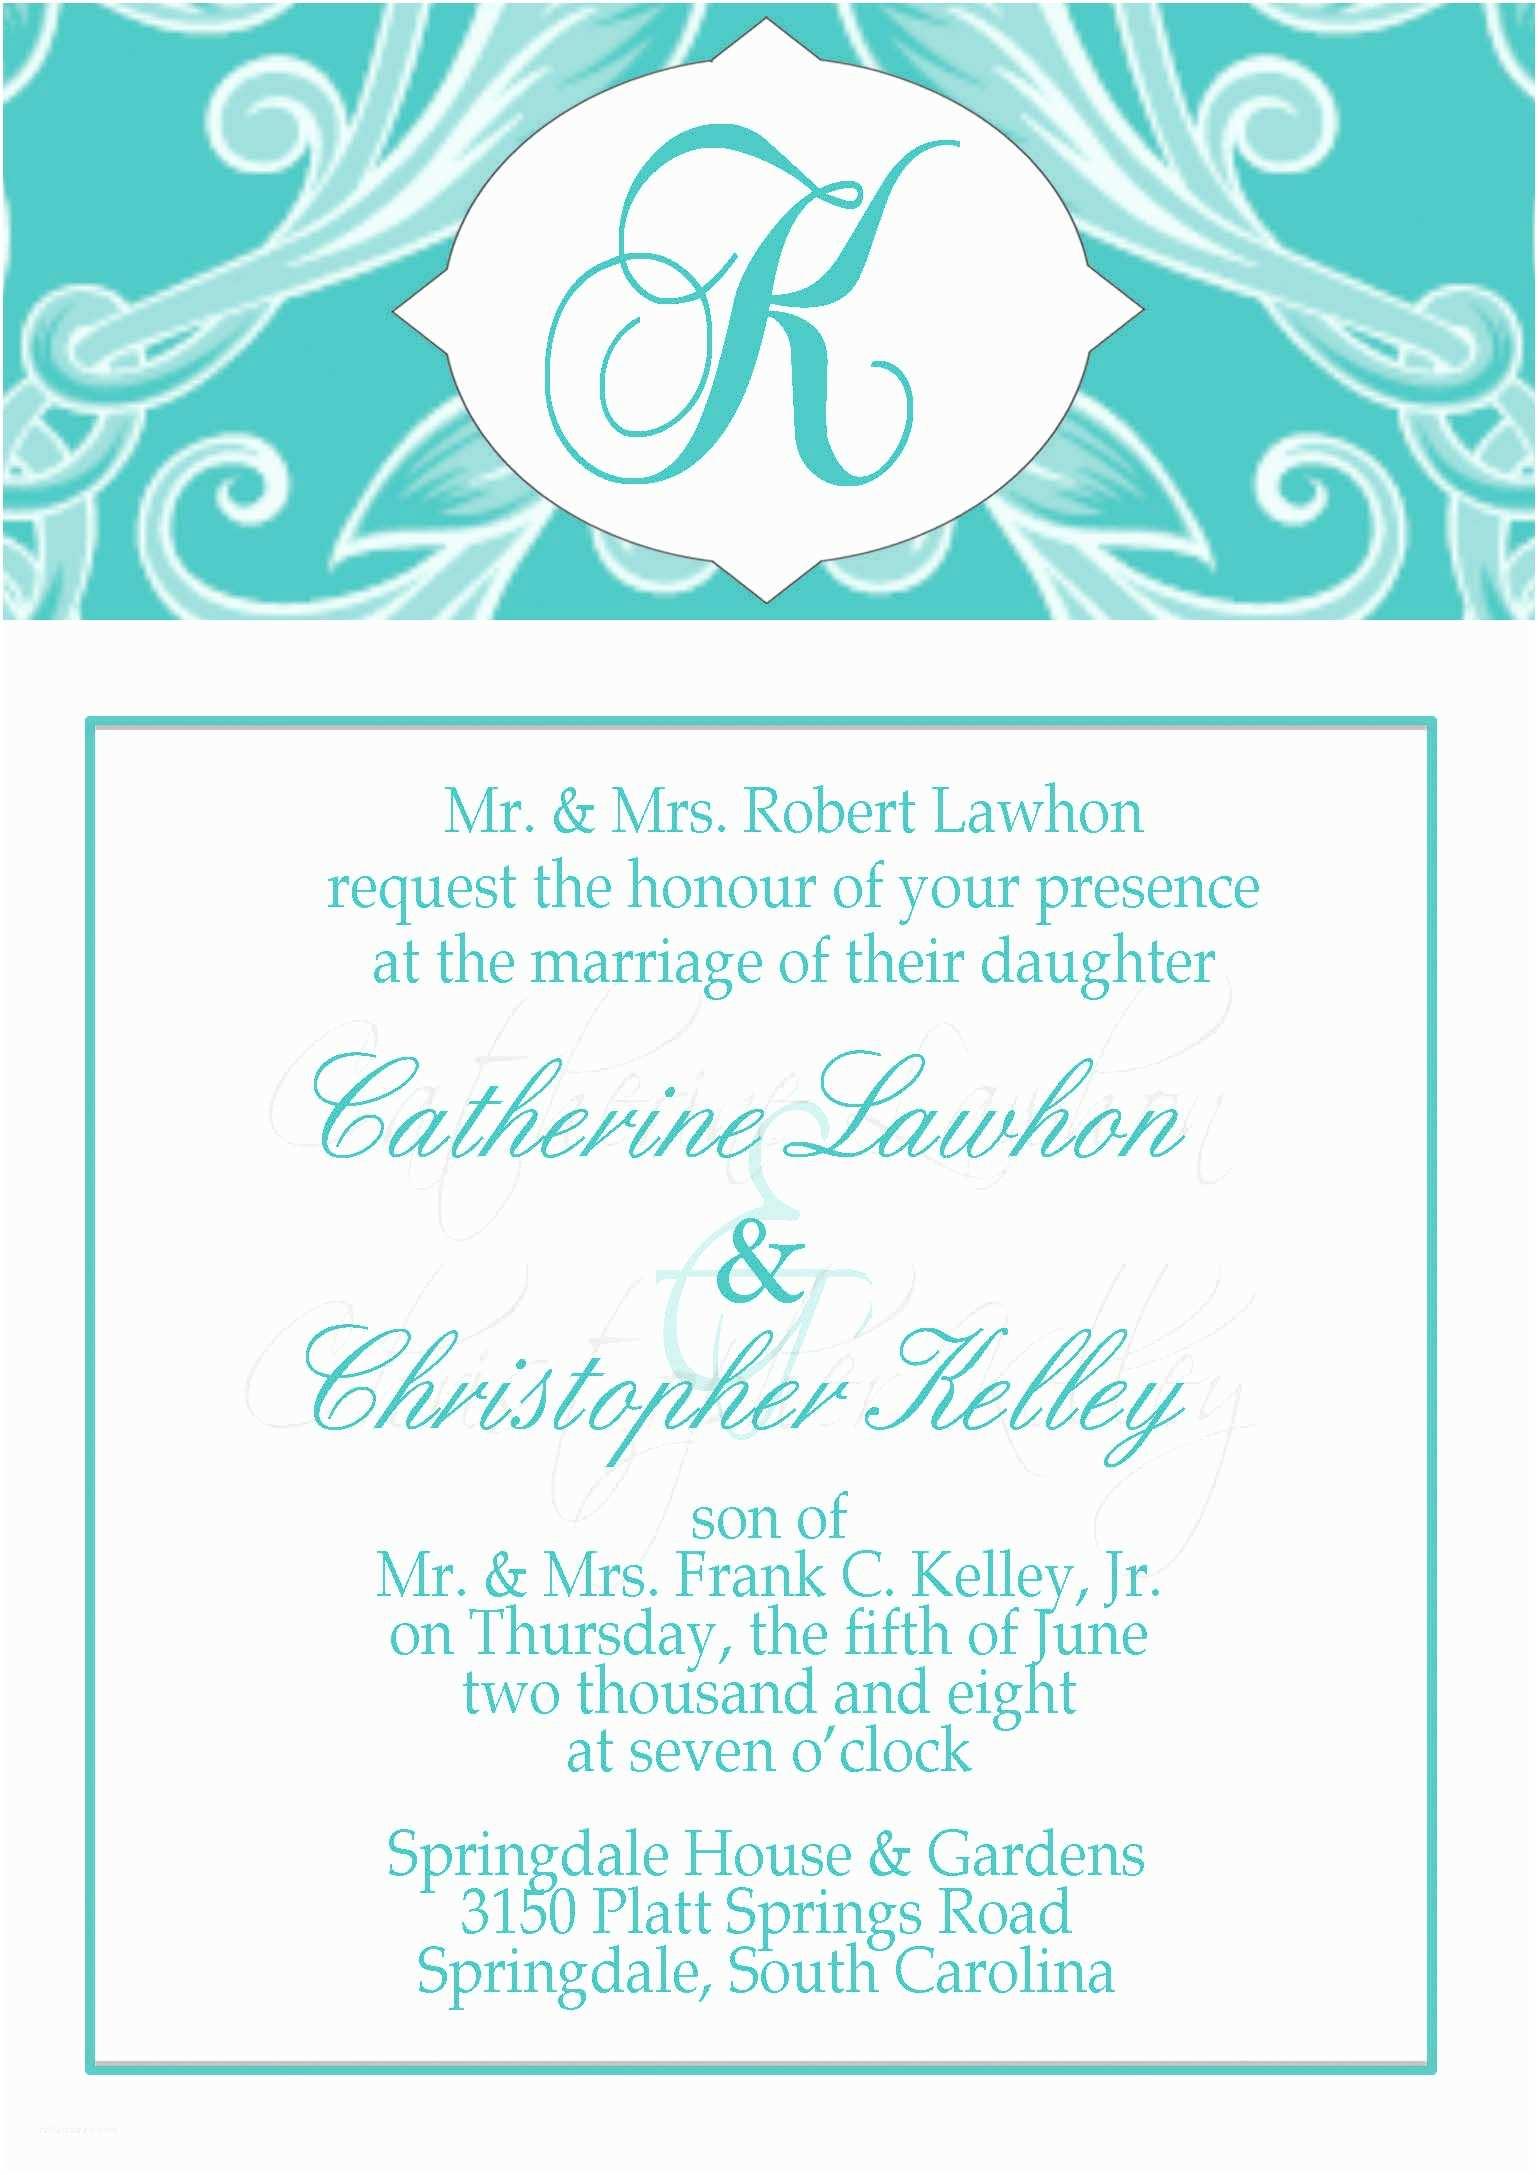 Bridal Shower Invitation Ideas Beach themed Invitation Cheap Image